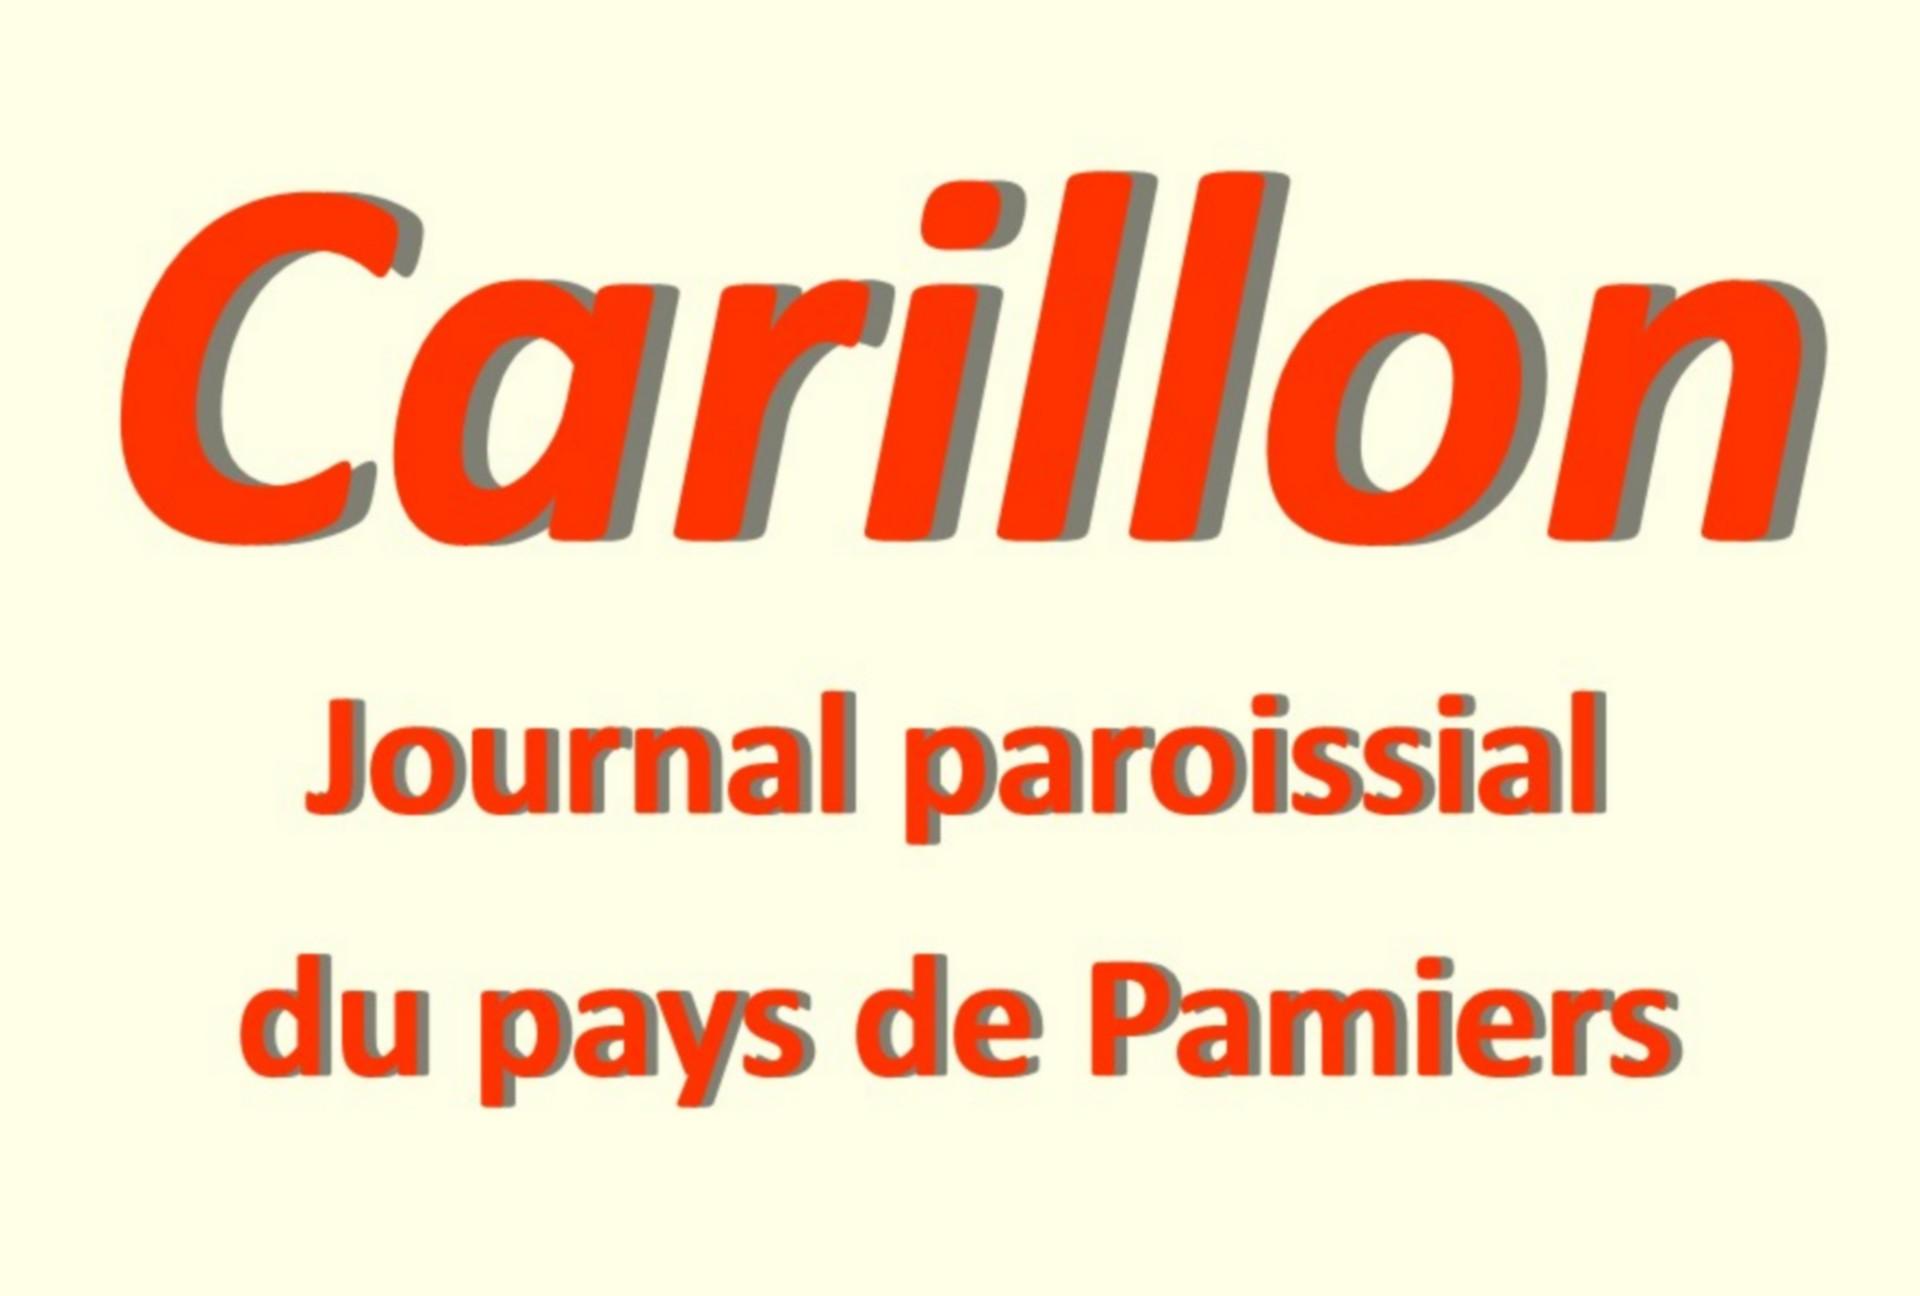 Journal paroissial : CARILLON